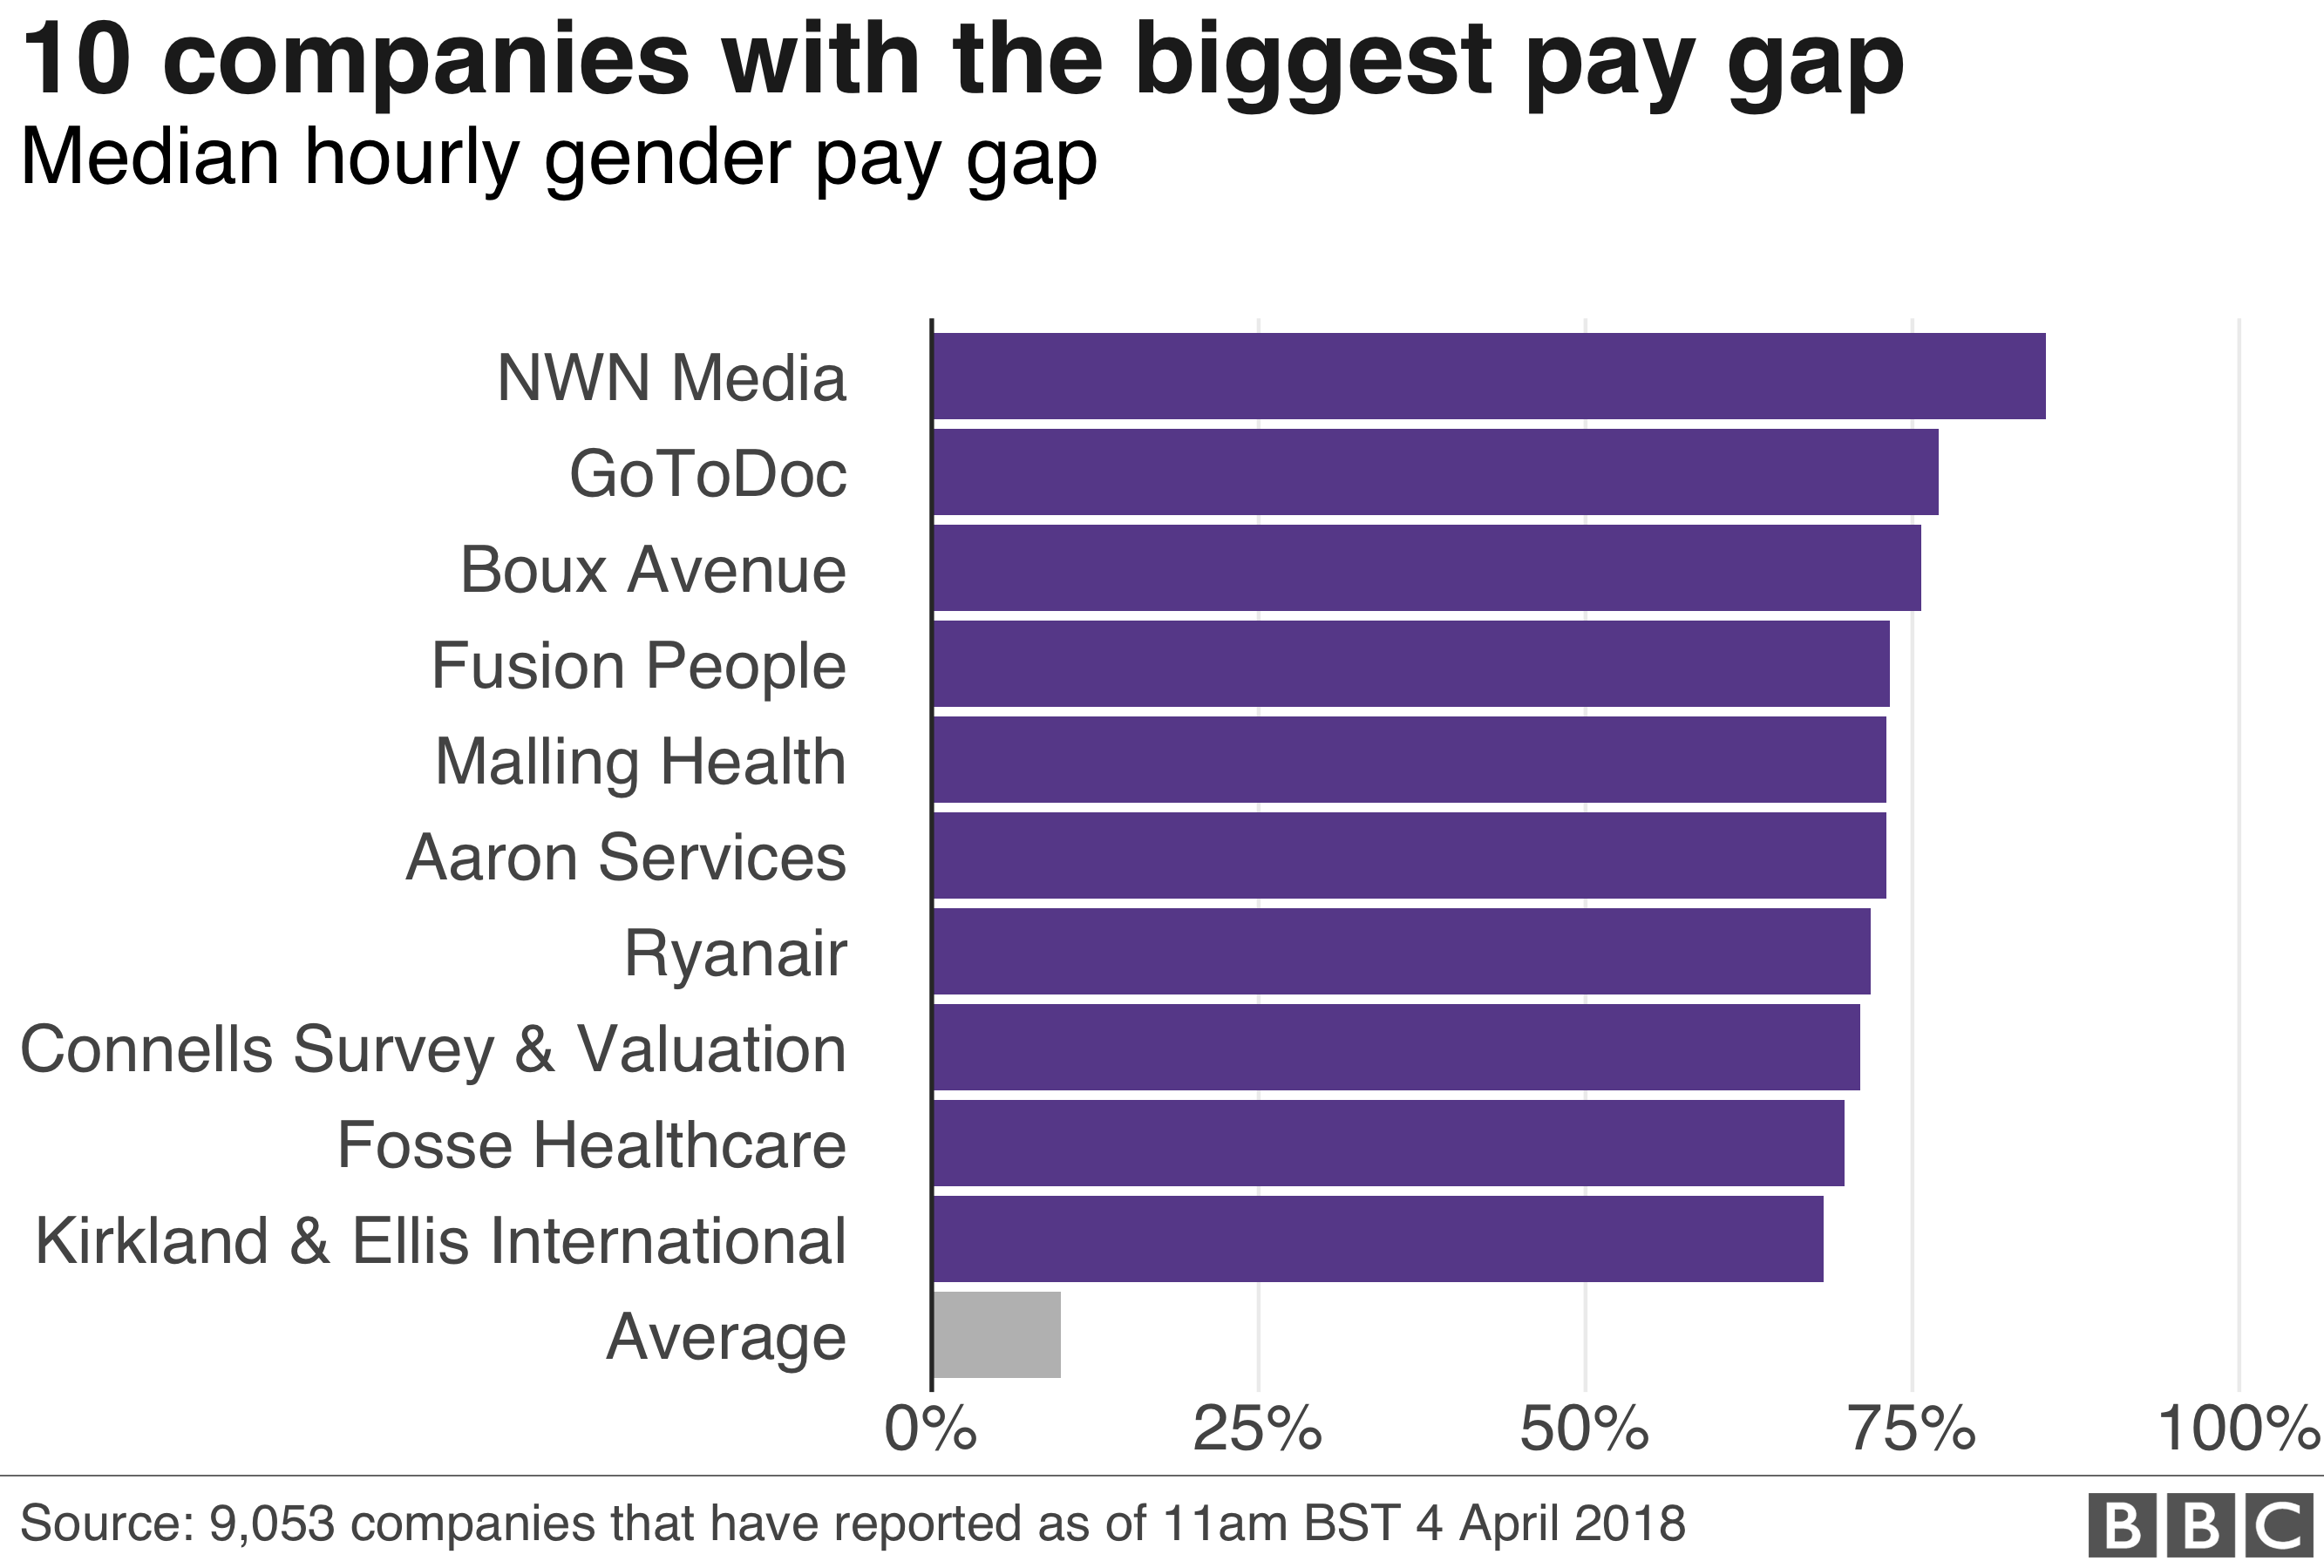 Biggest pay gaps